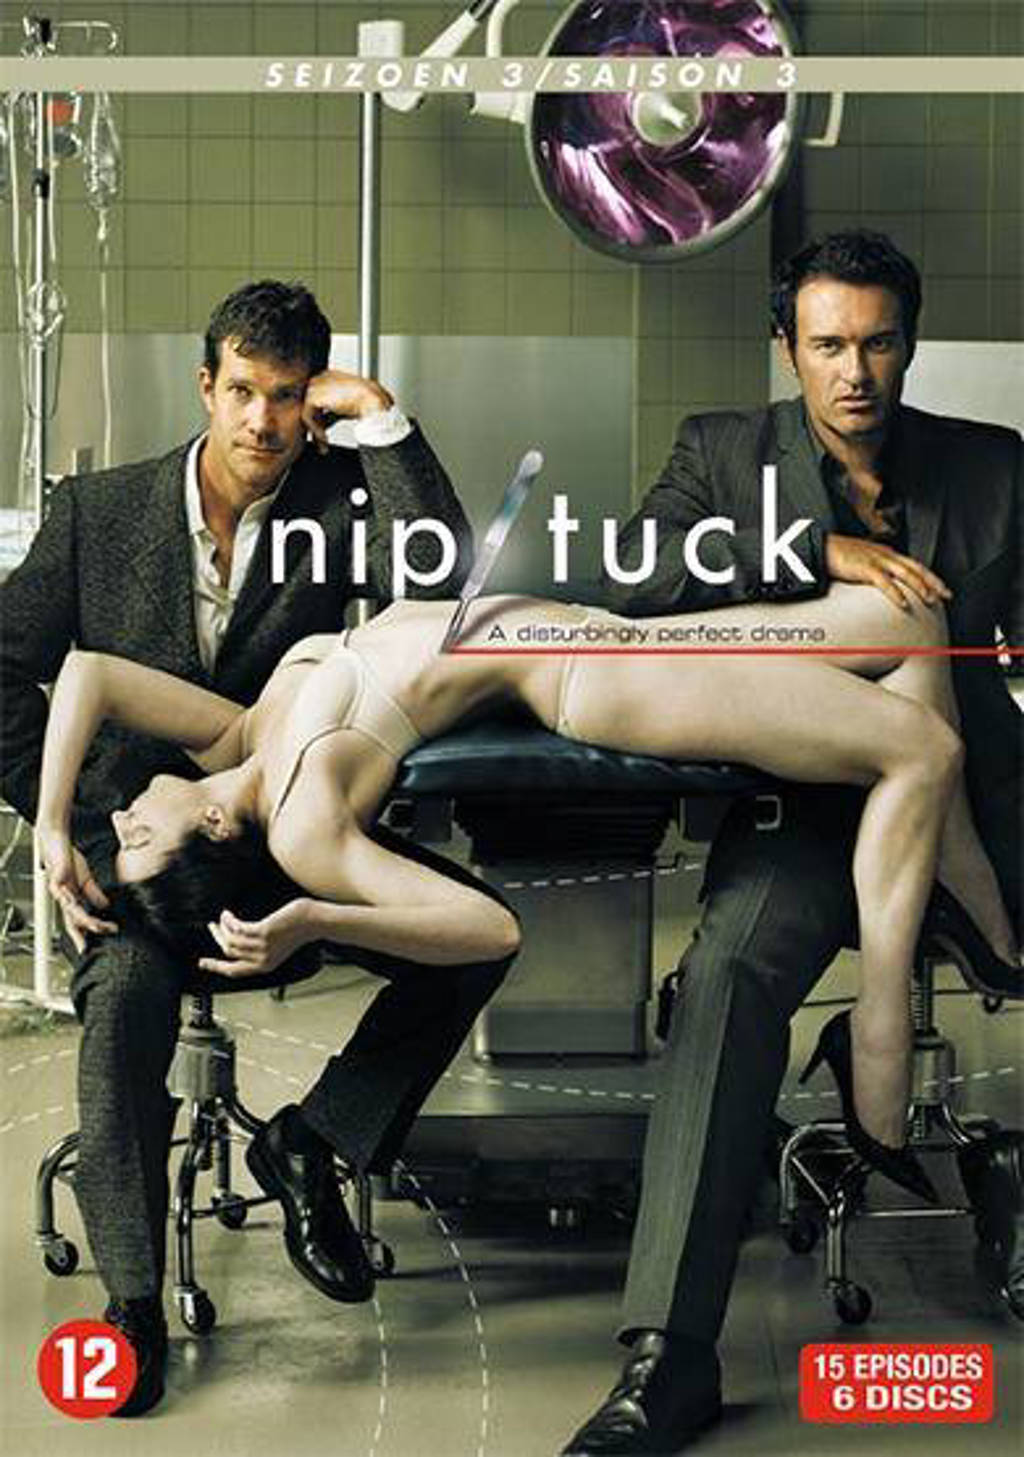 Nip tuck gay storyline